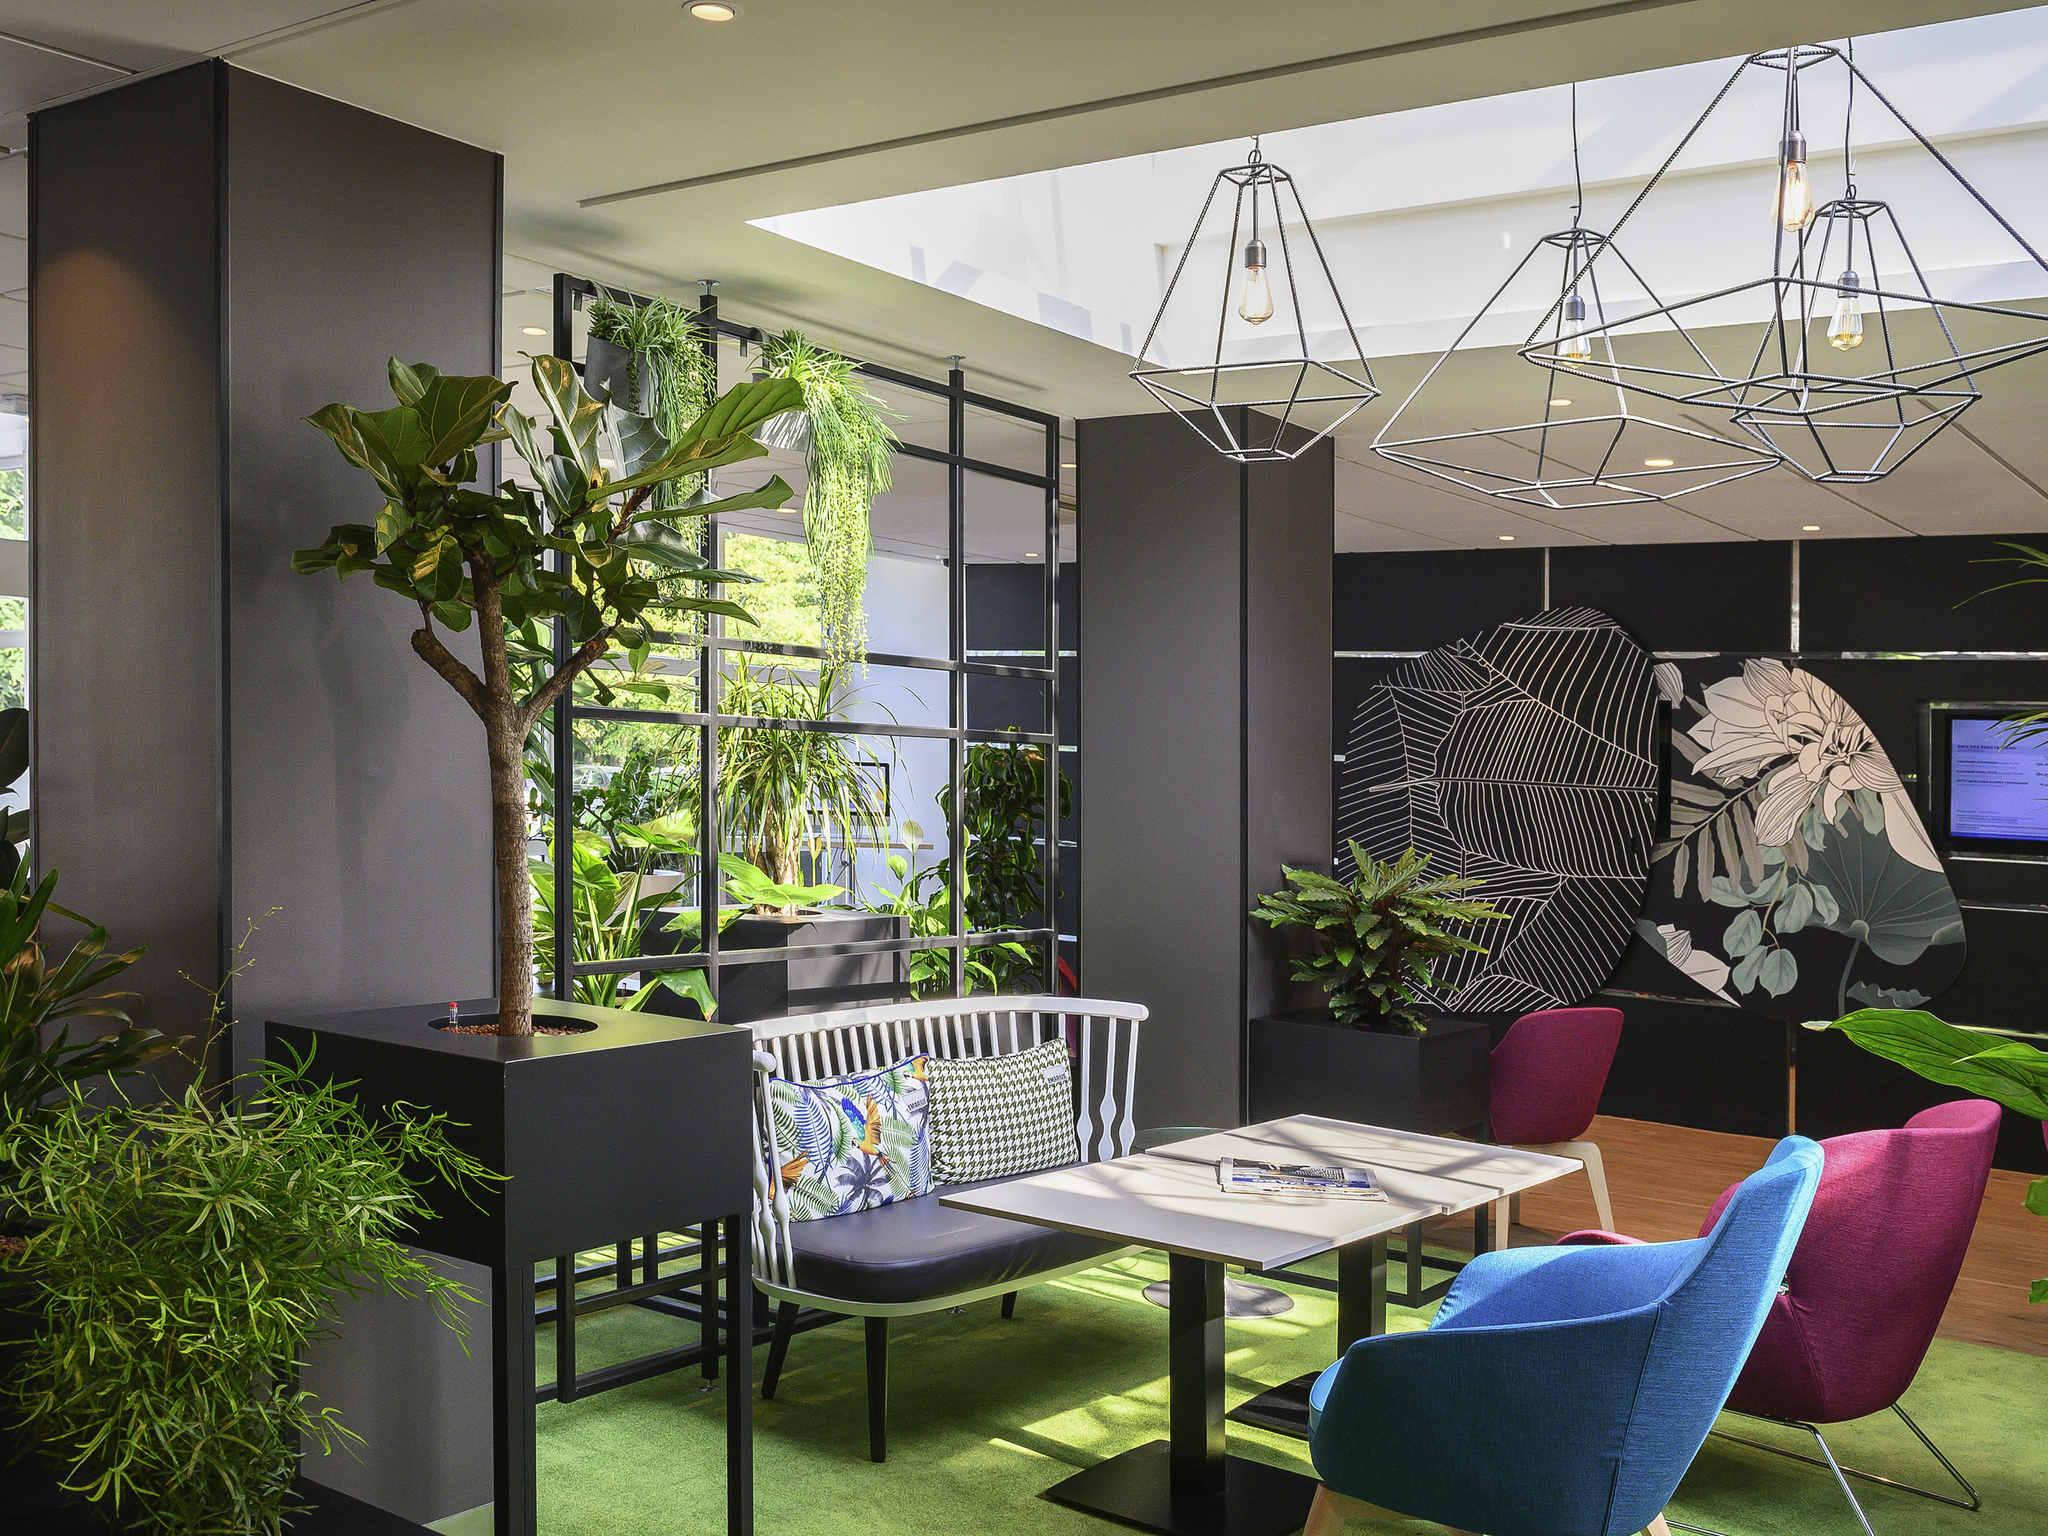 Hotel – Novotel Evry Courcouronnes